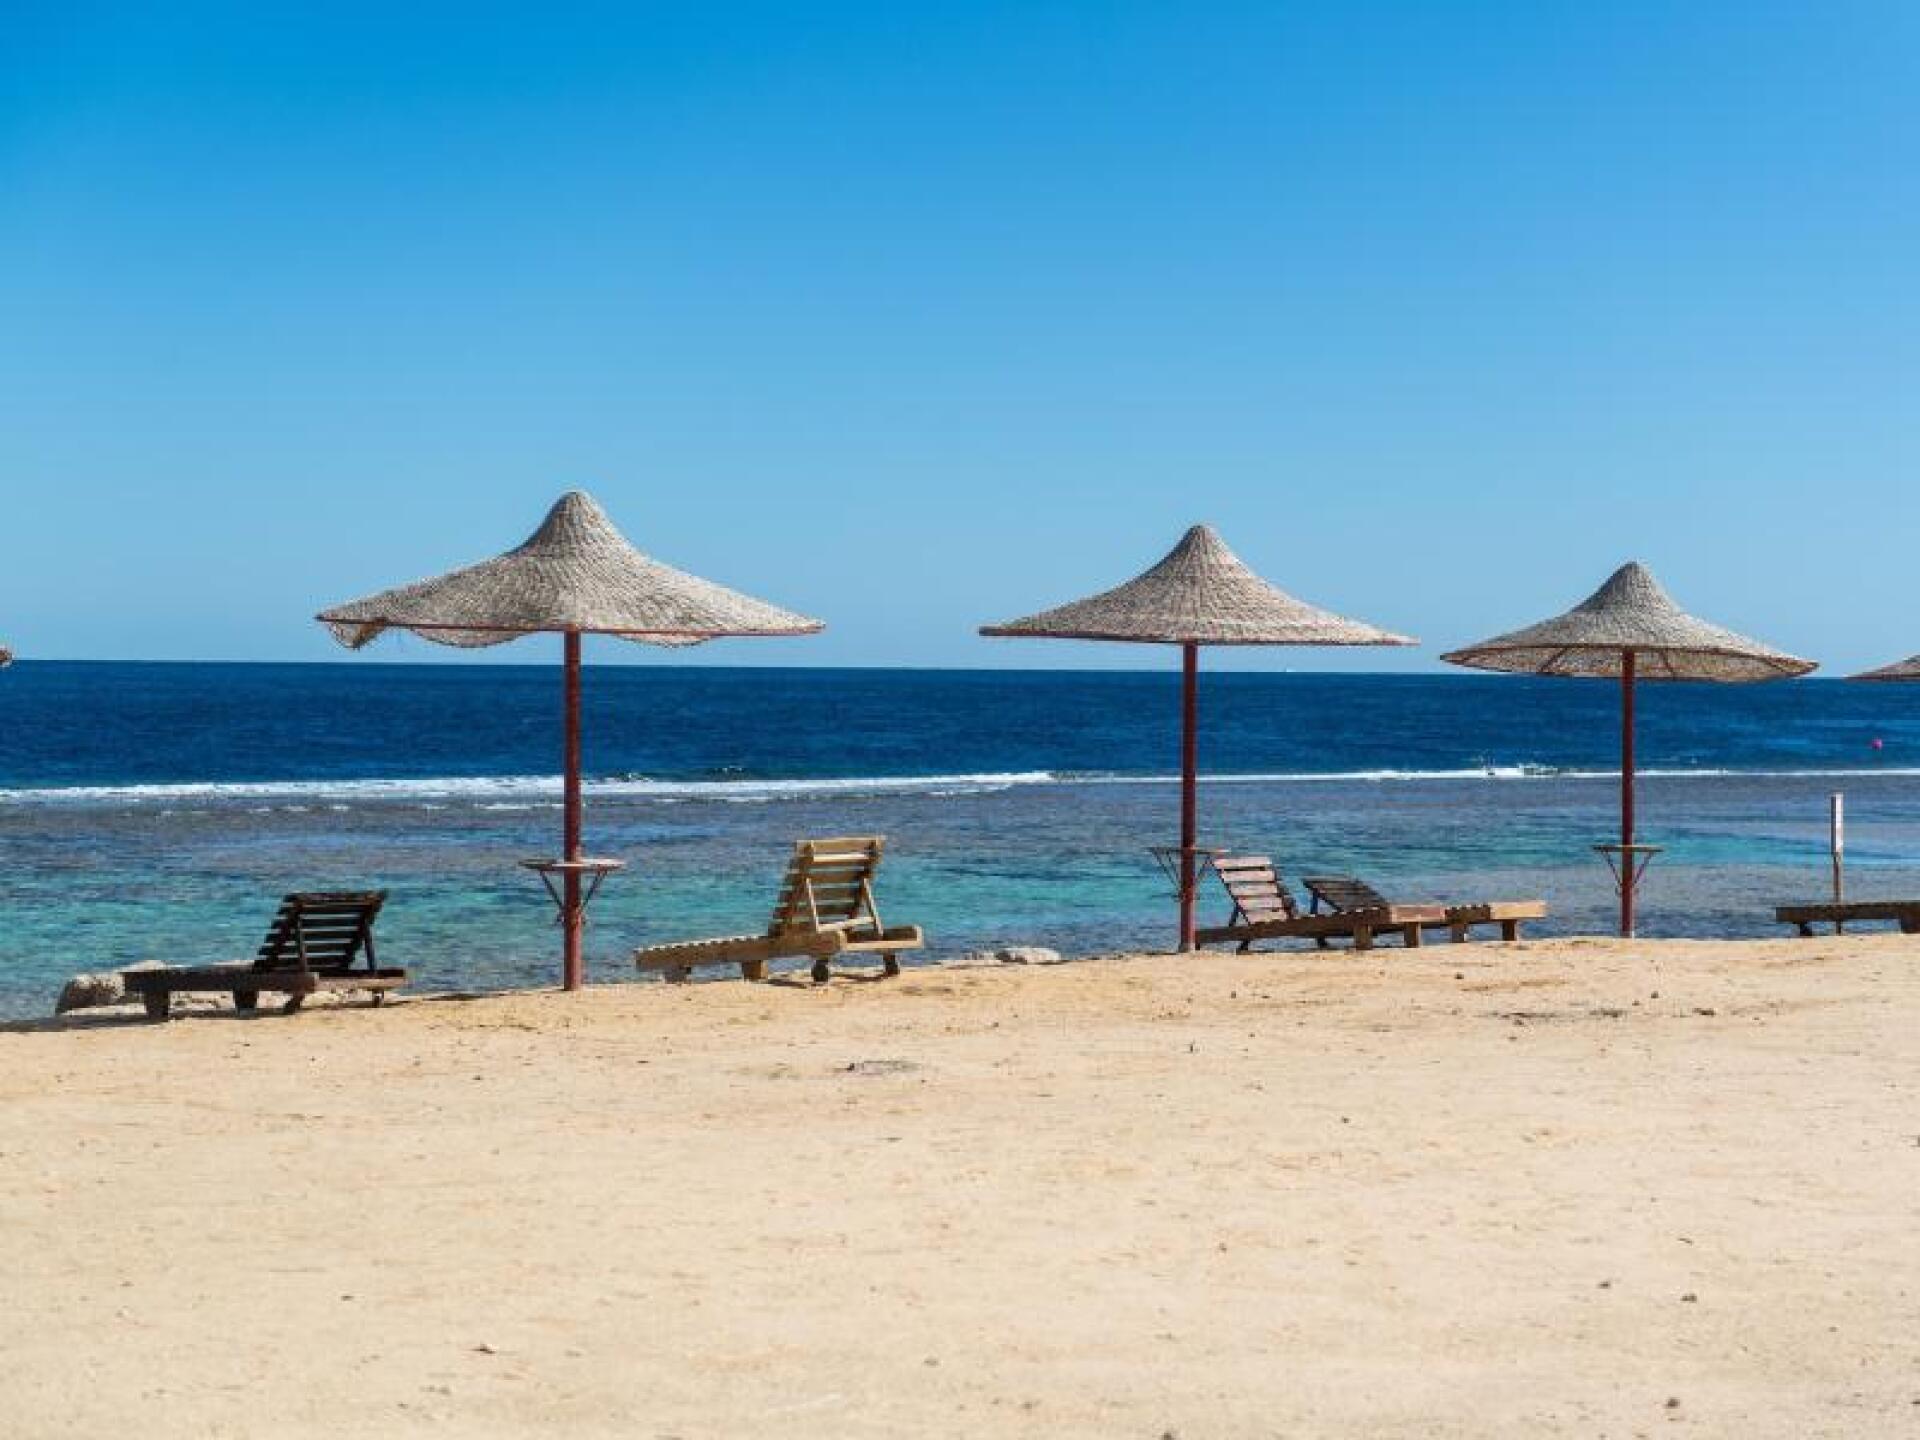 Leerer Strand in Ägypten